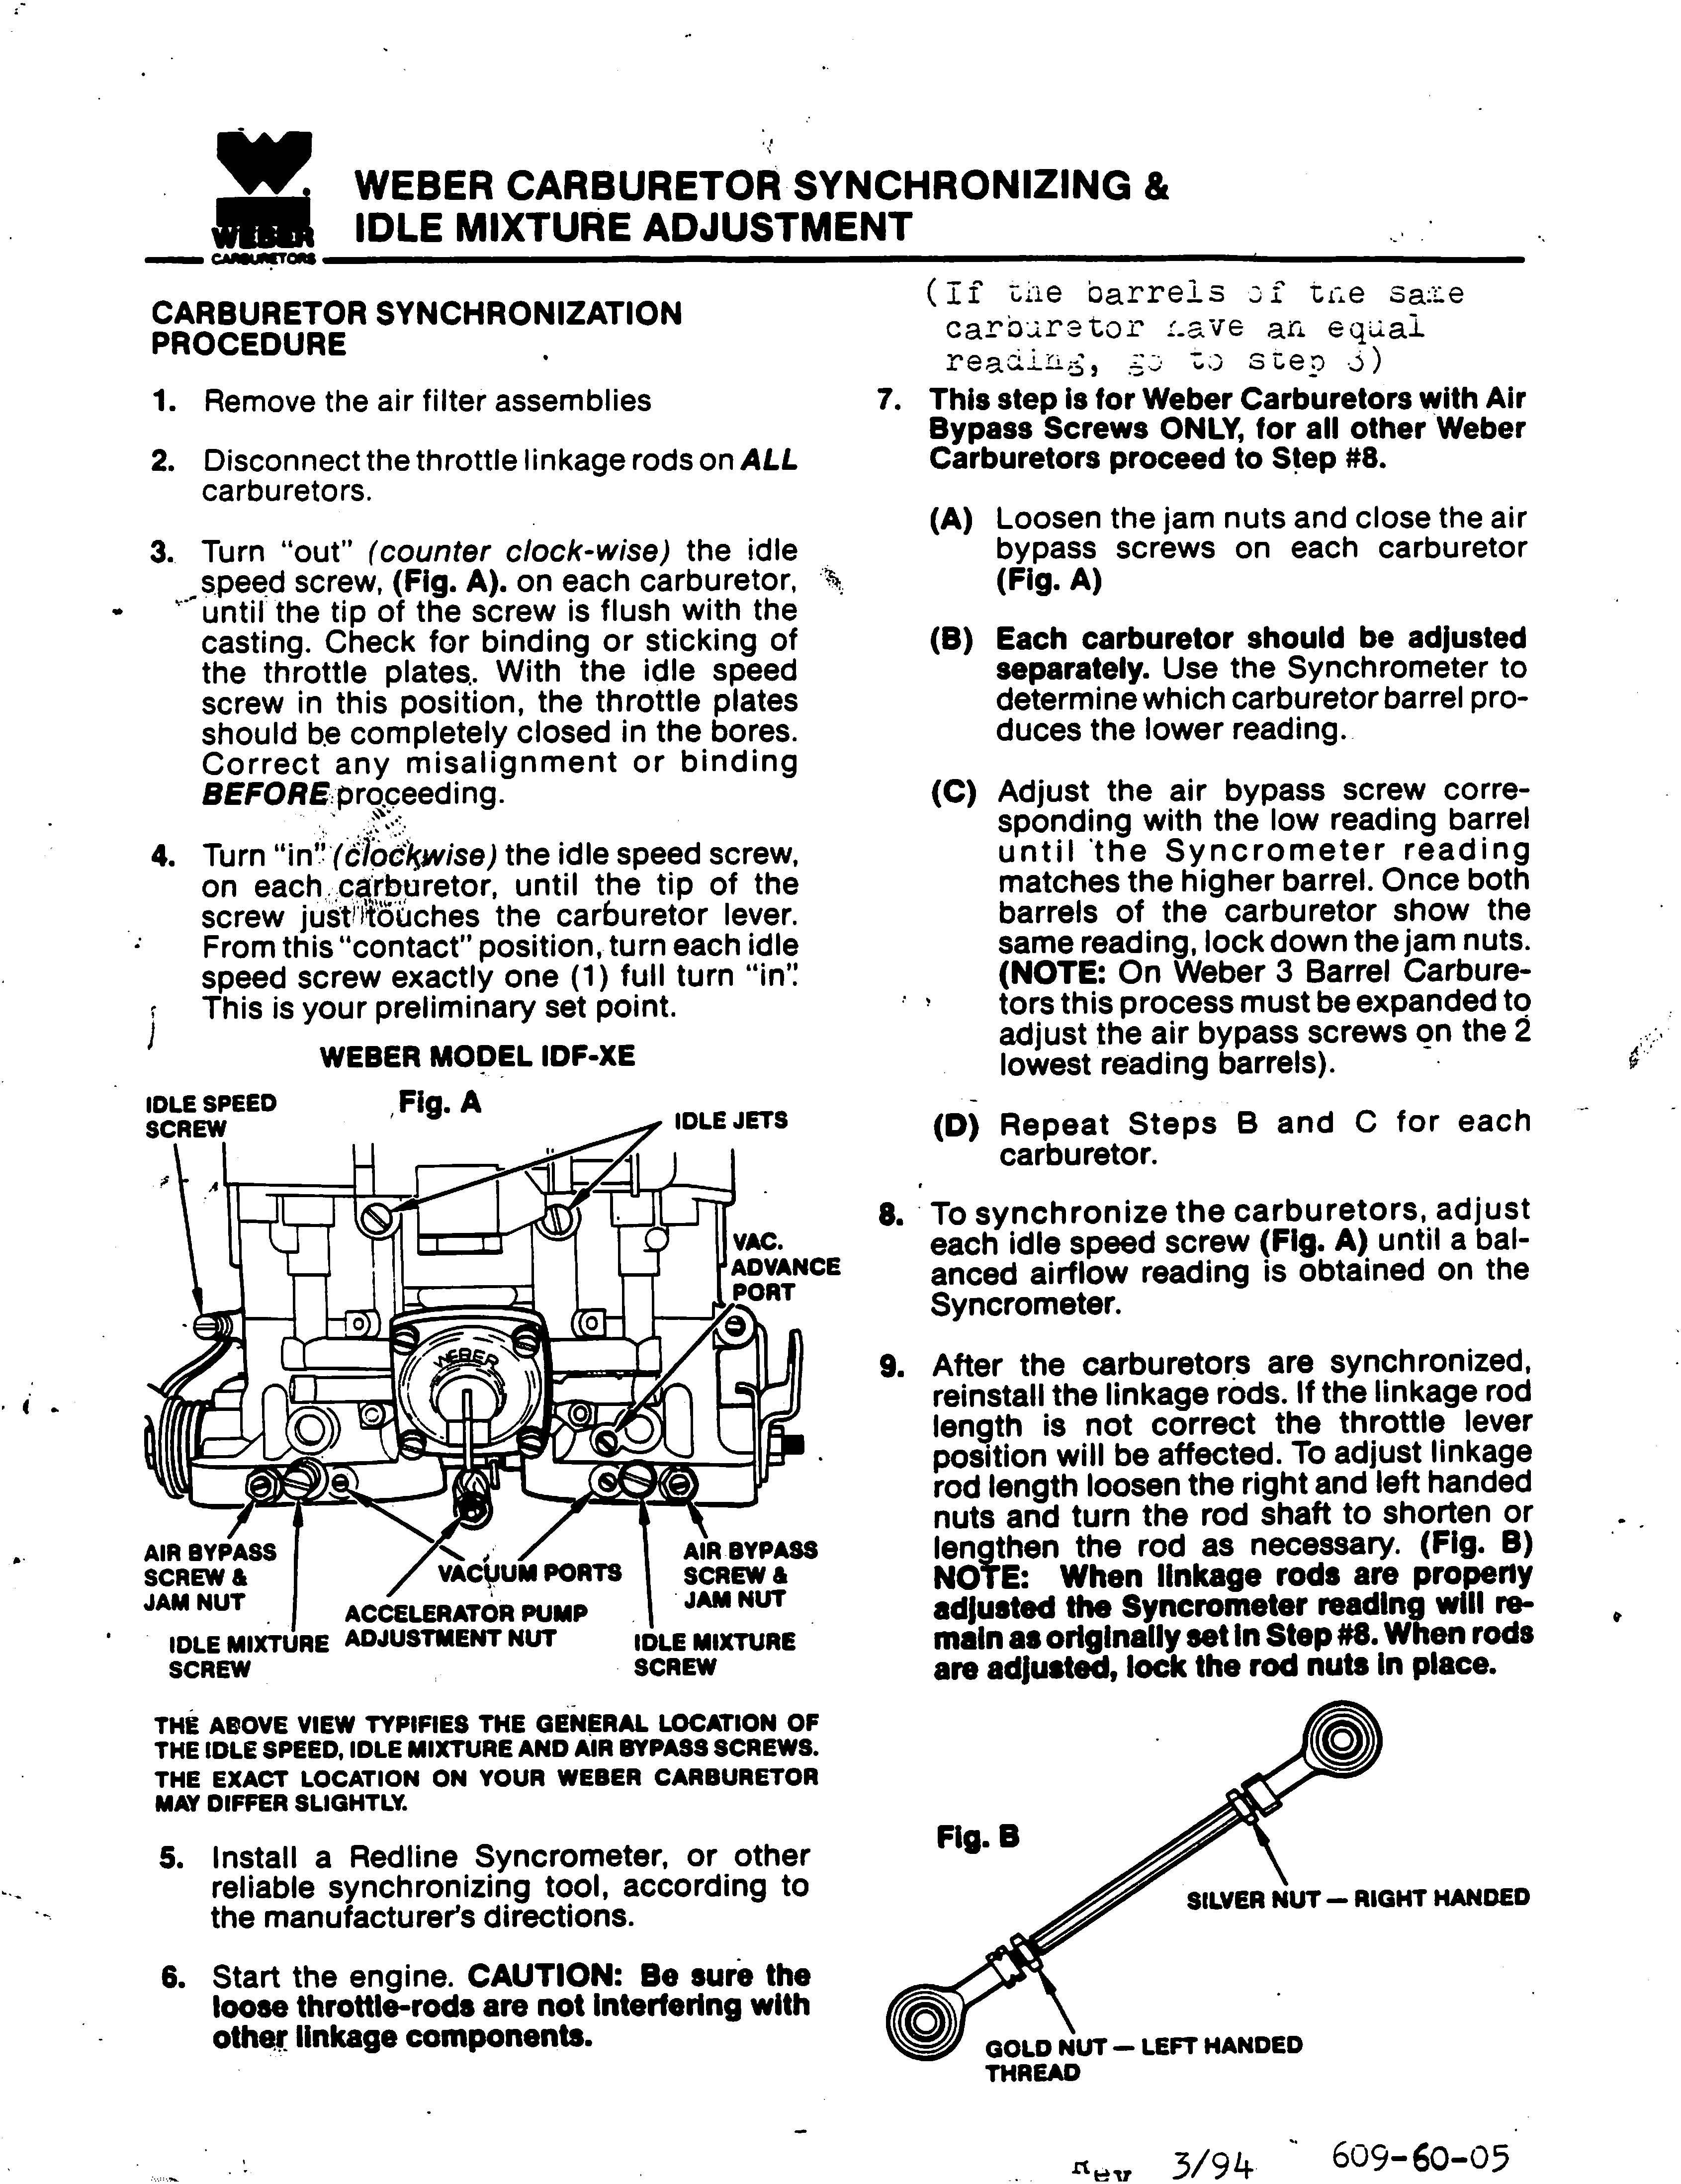 weber carburetor rebuild instructions